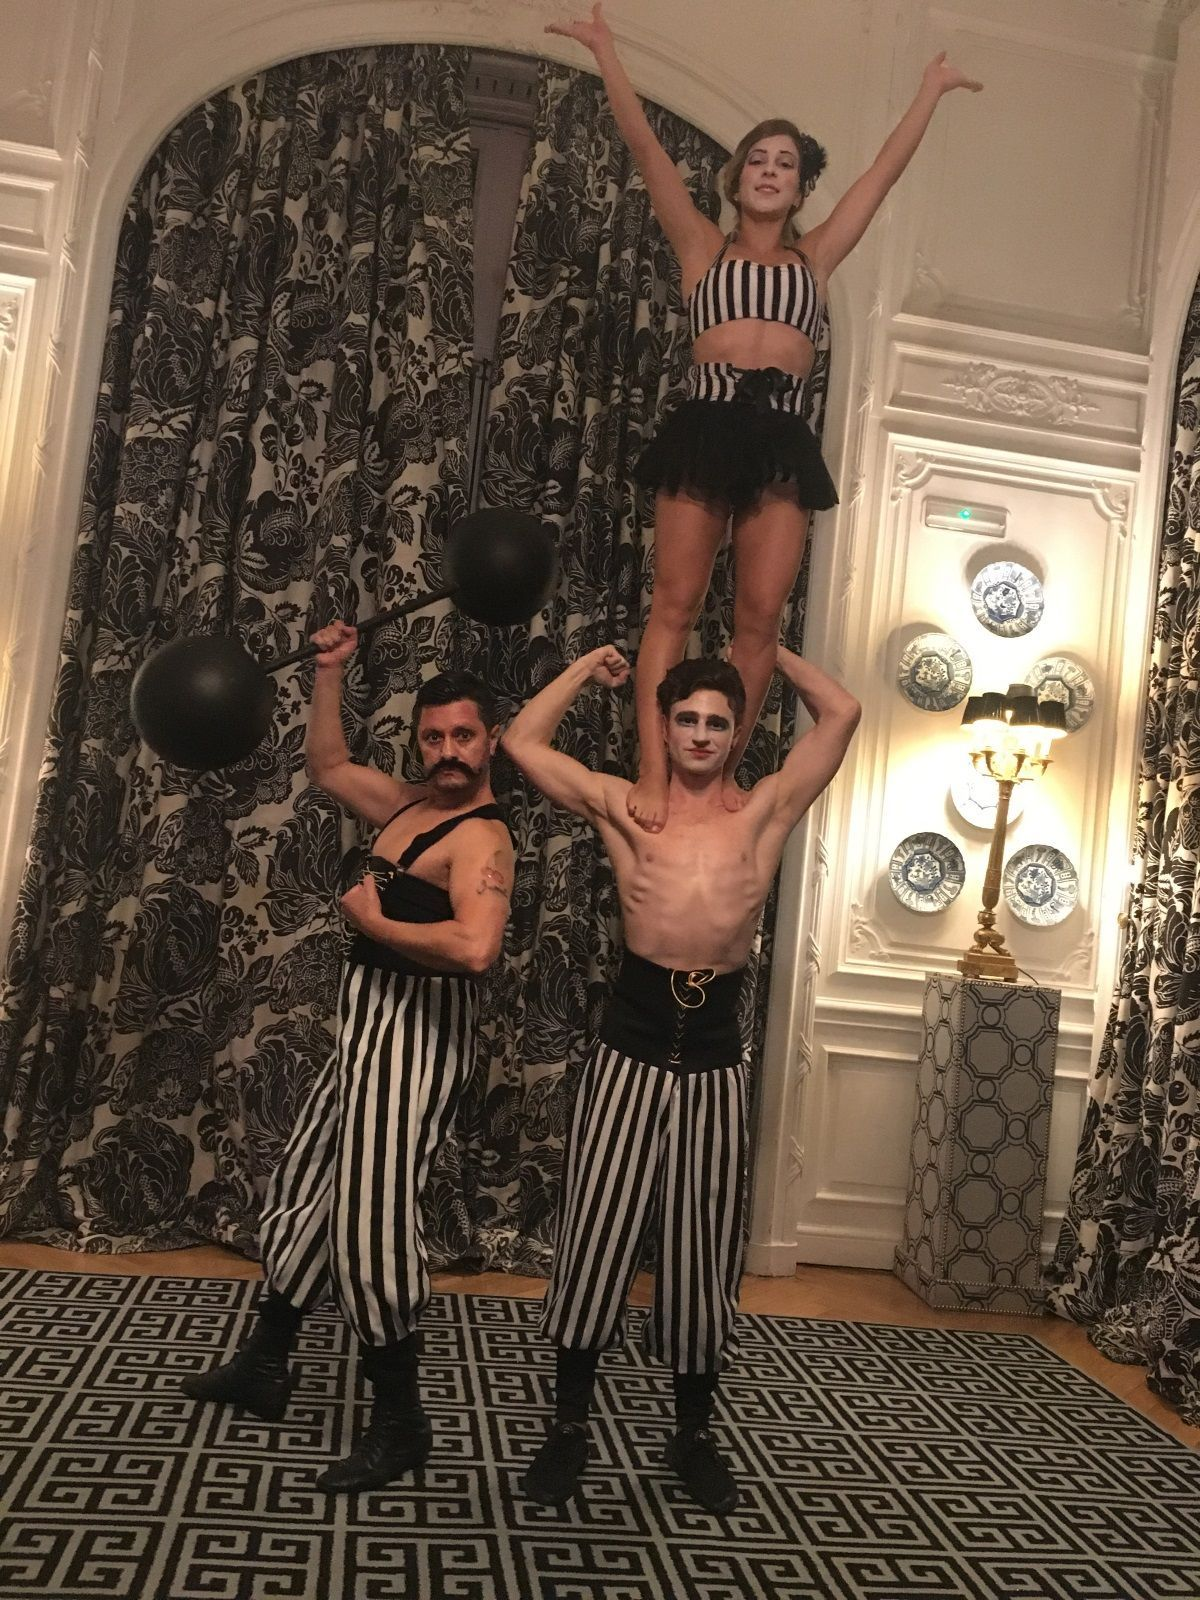 Circus performances - Acrobats